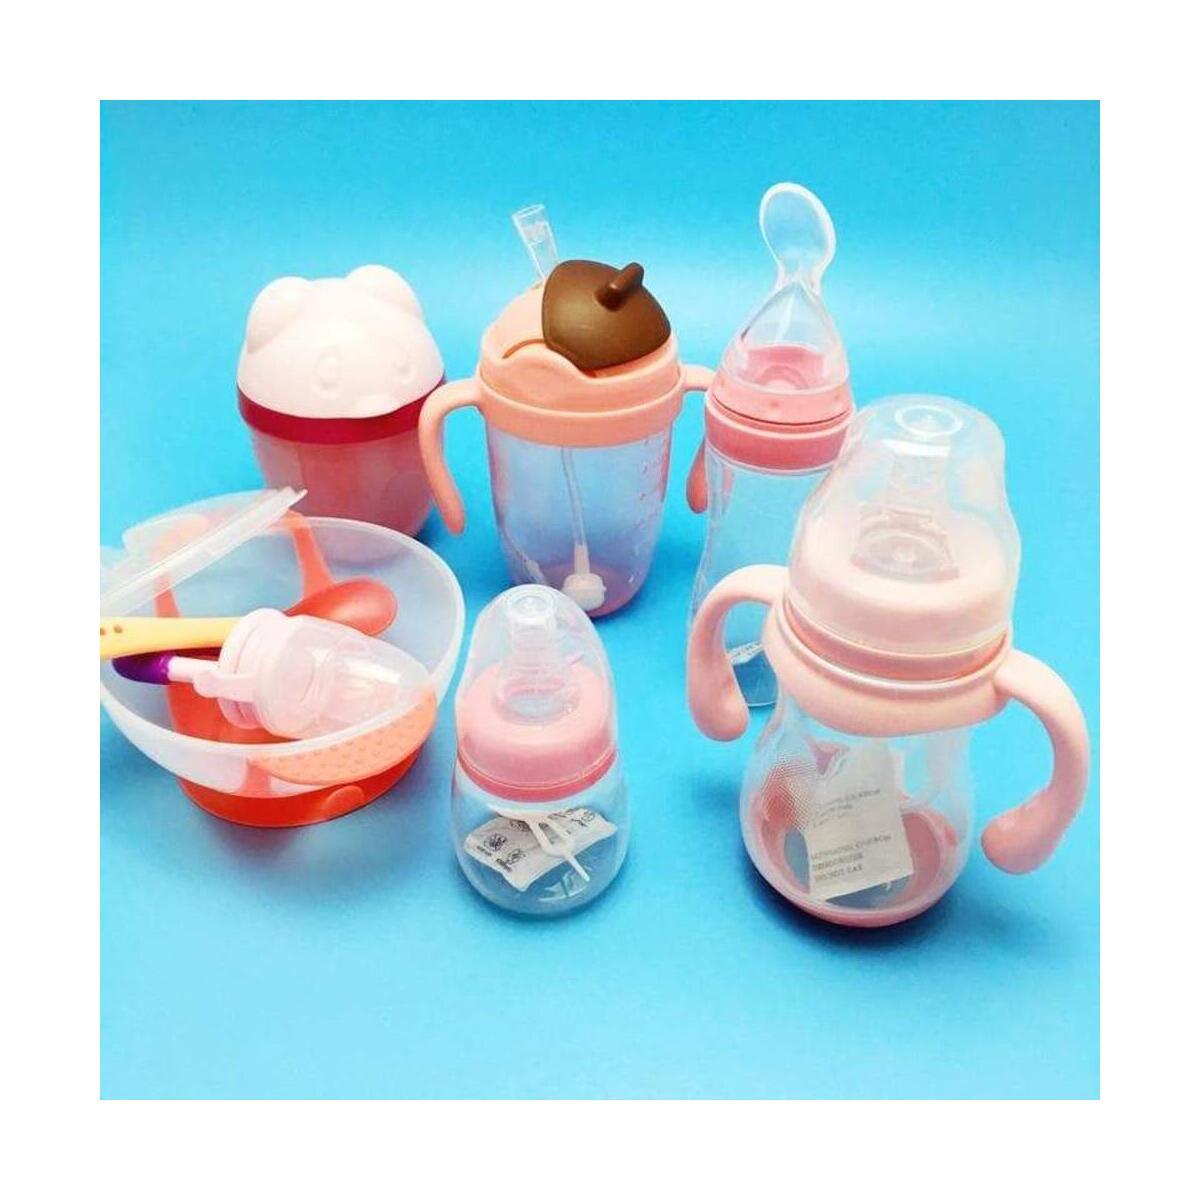 Baby Toddler Suction Silicone Feeding Set